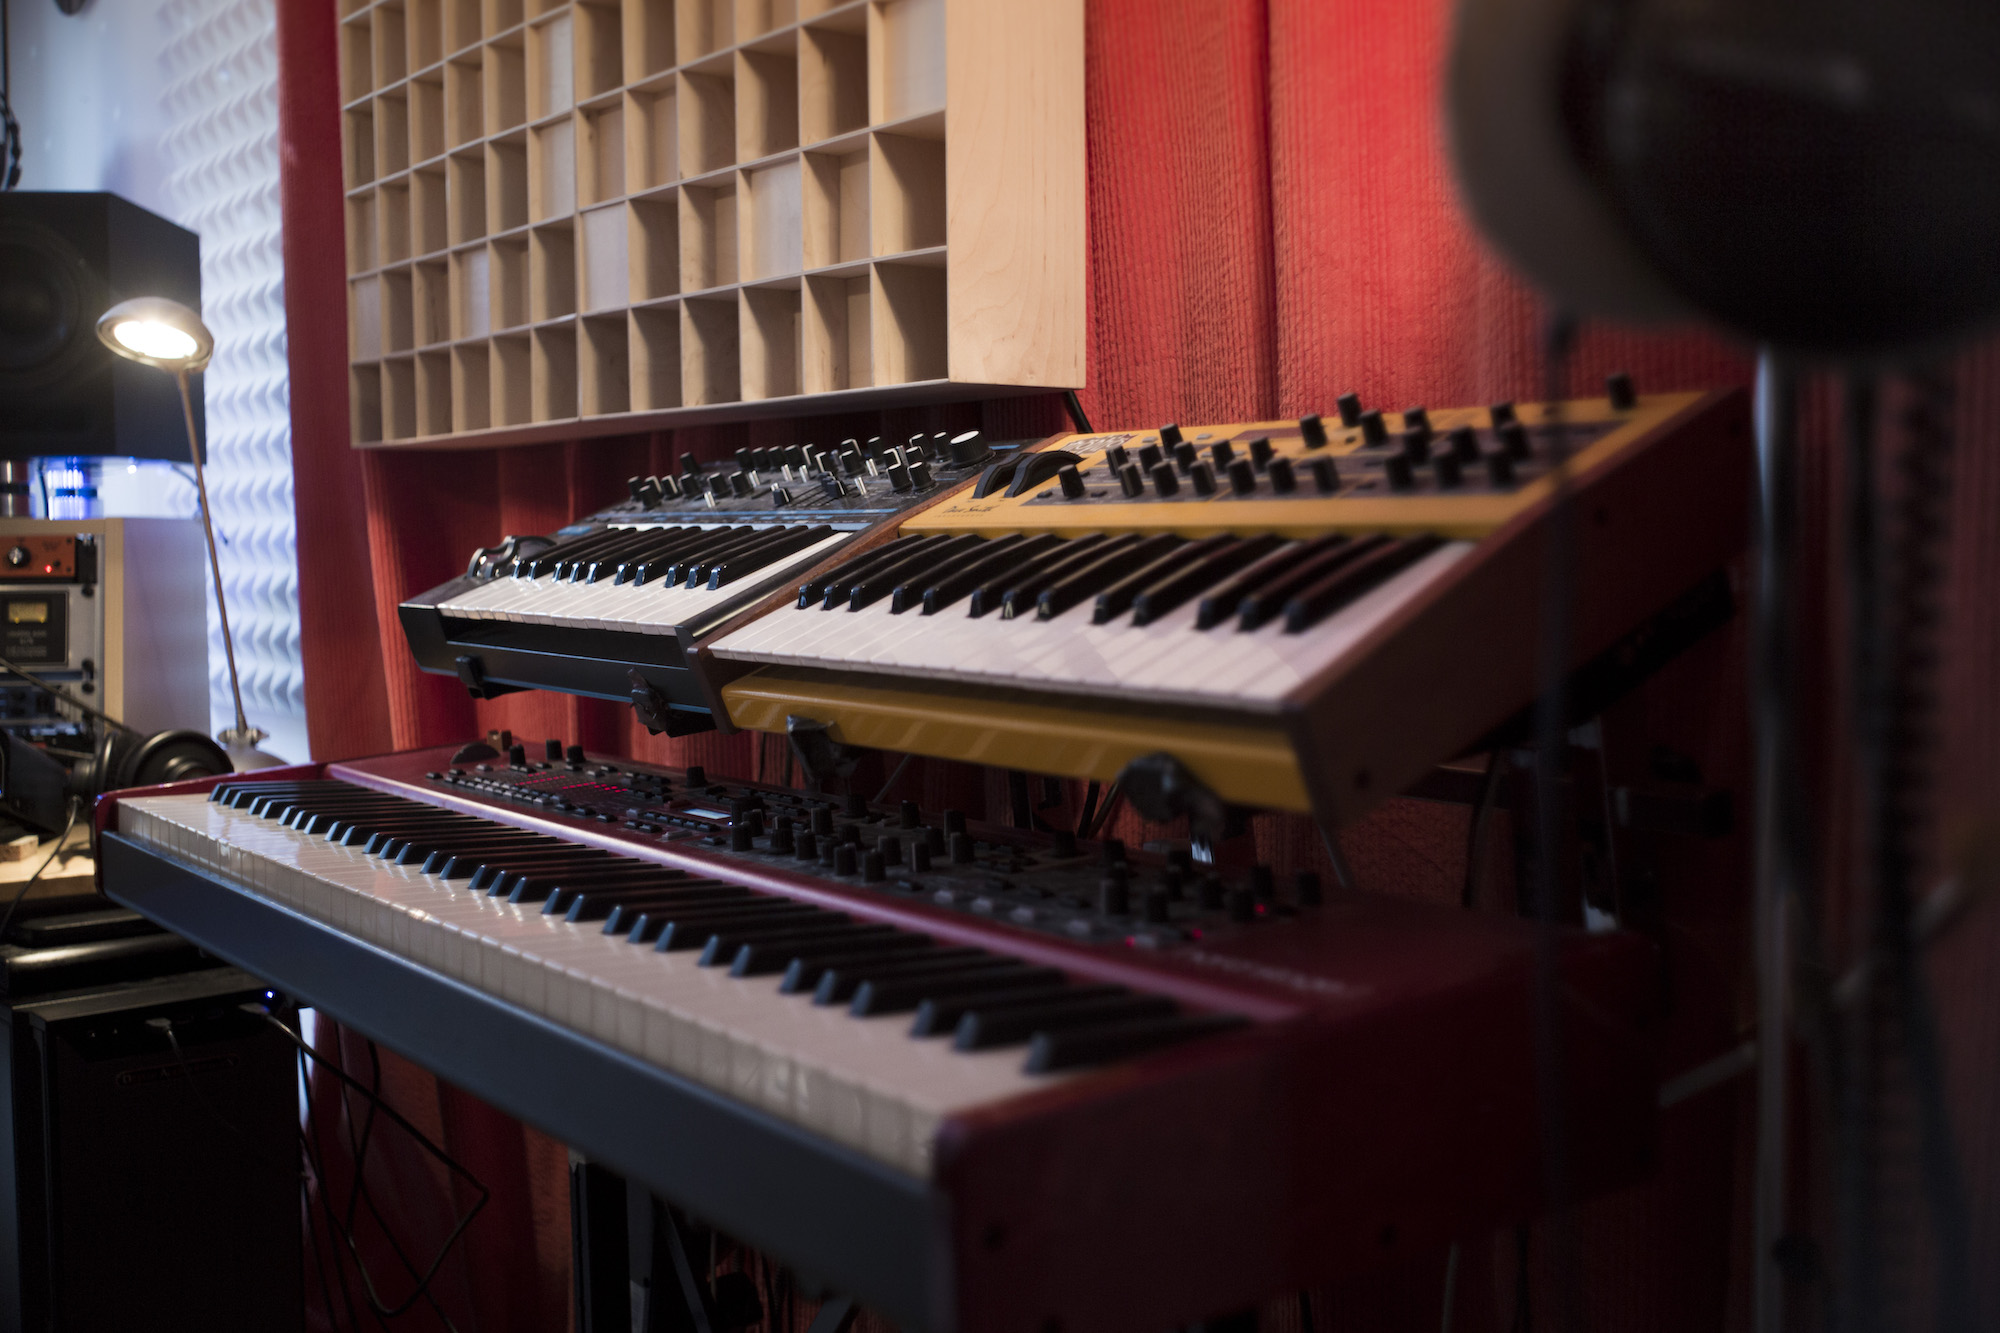 Keyboards Kopie